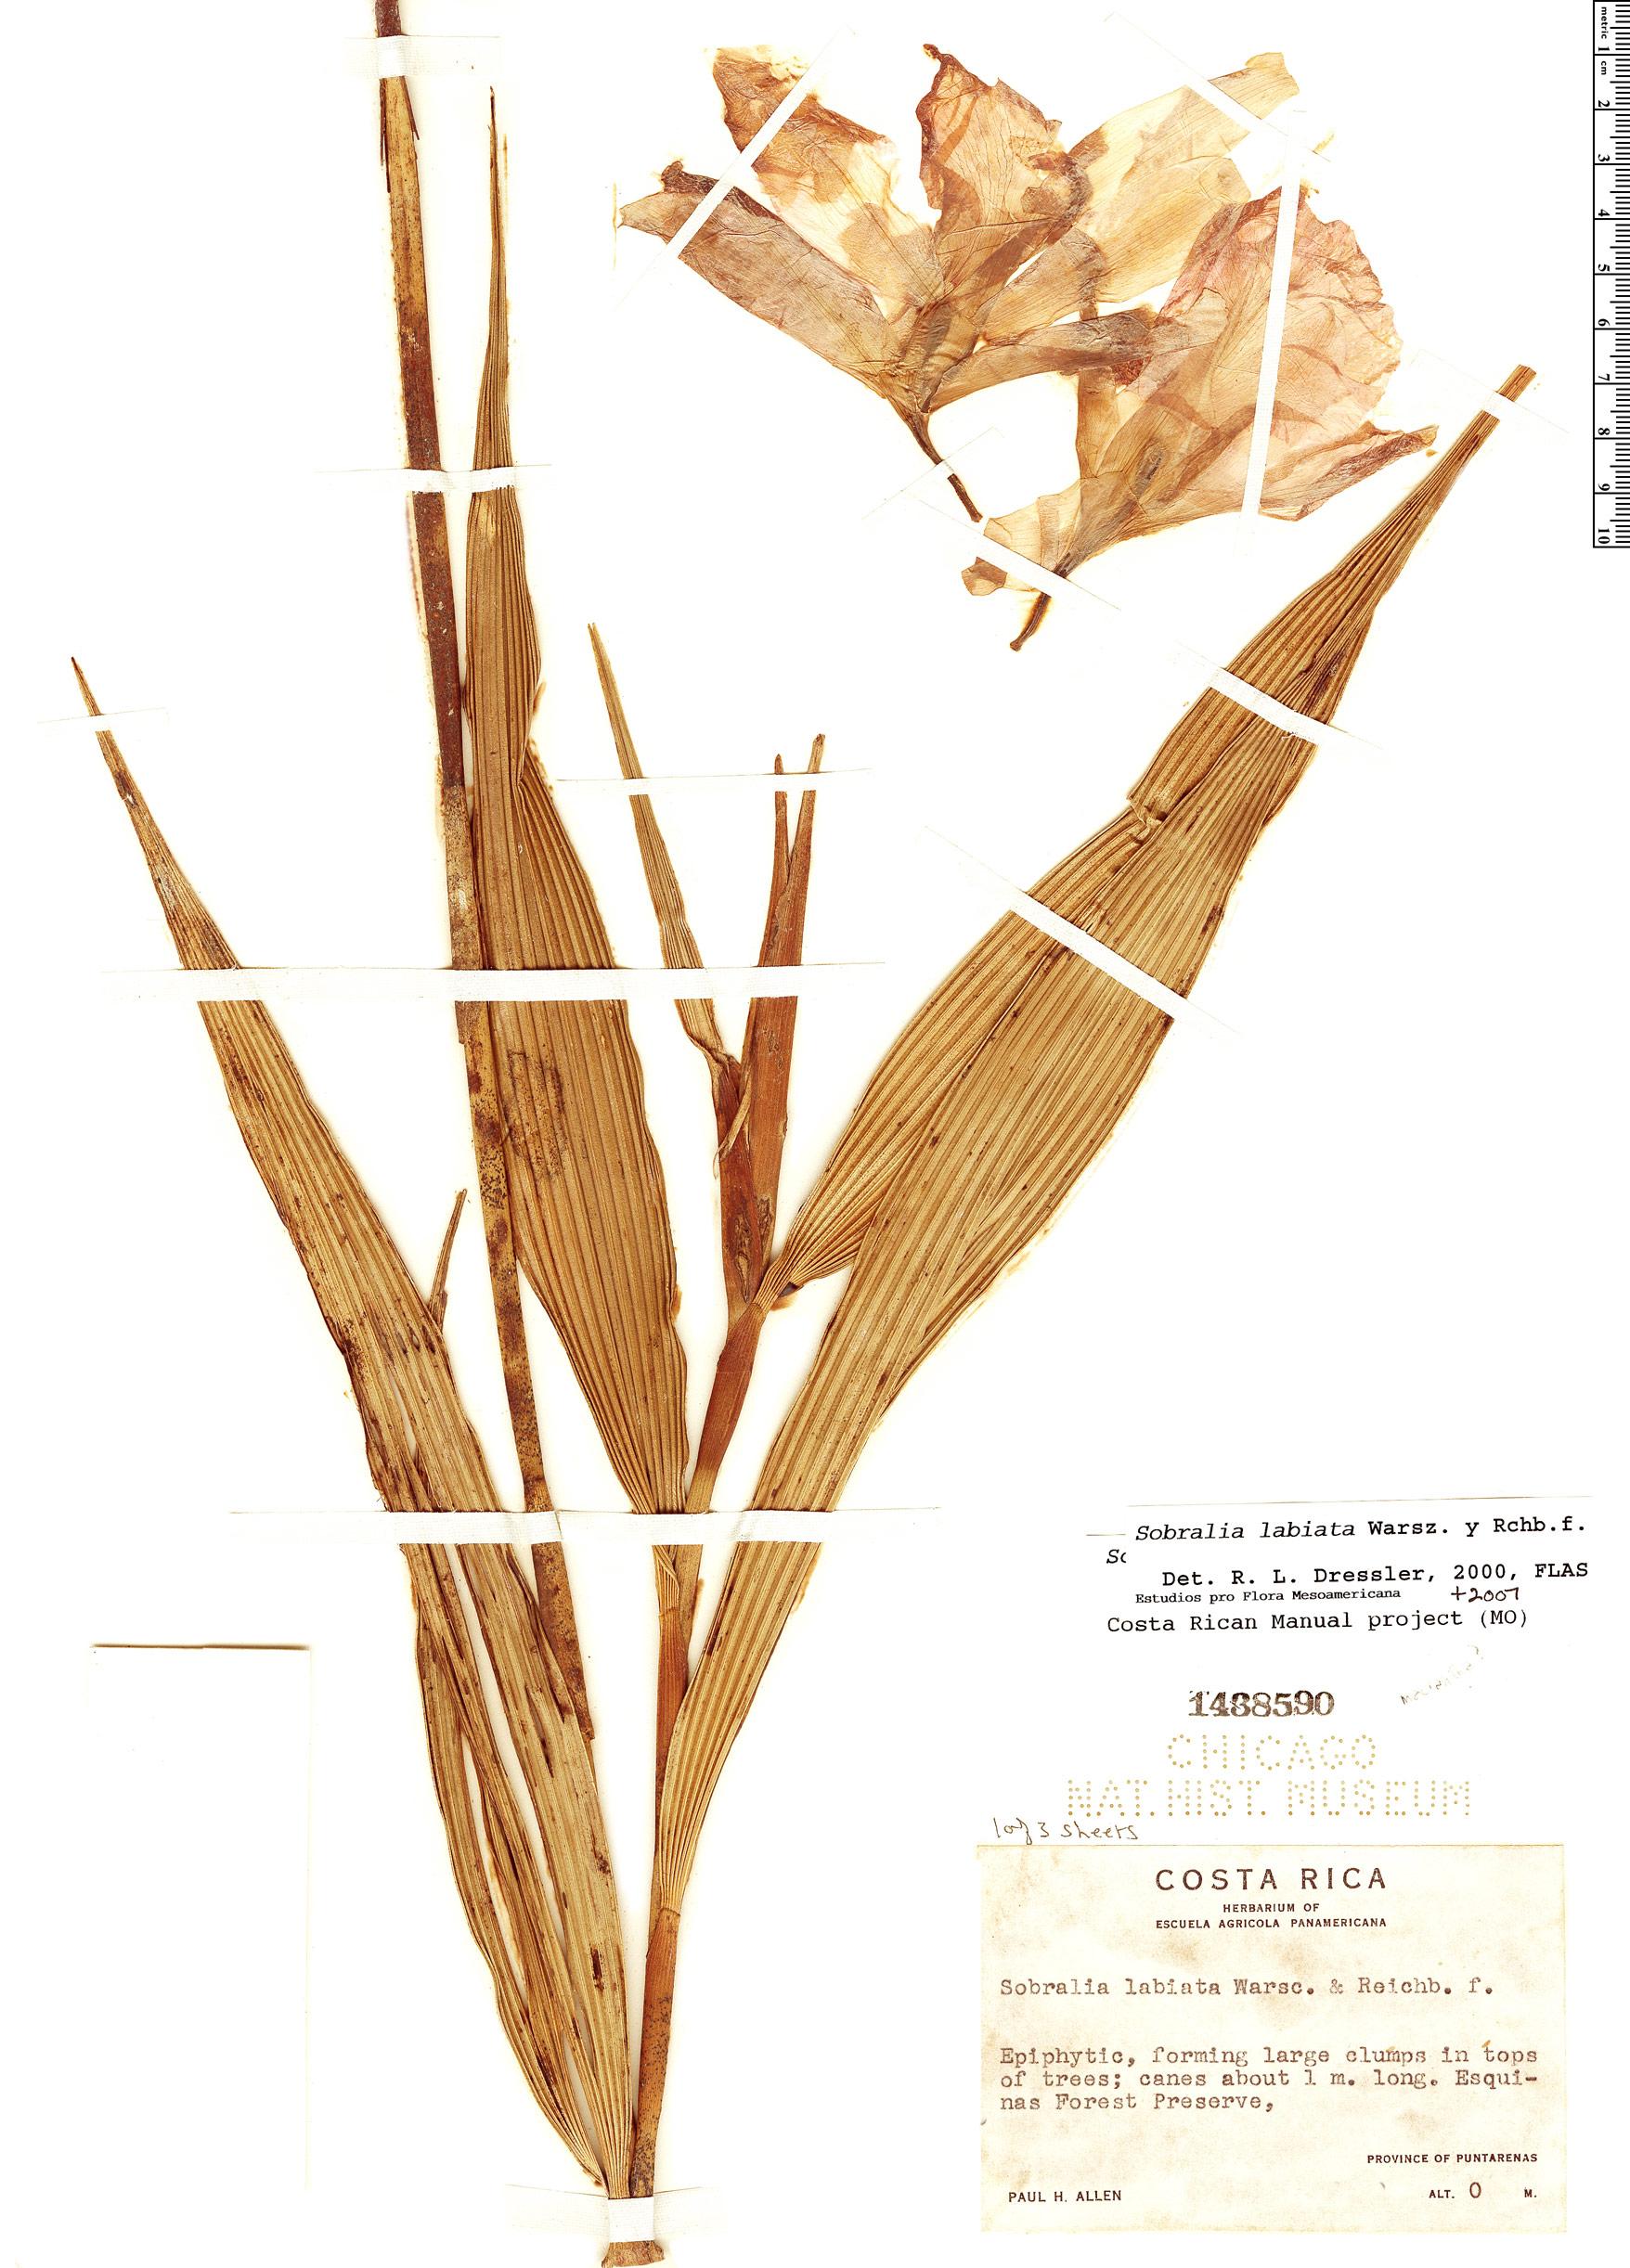 Specimen: Sobralia labiata